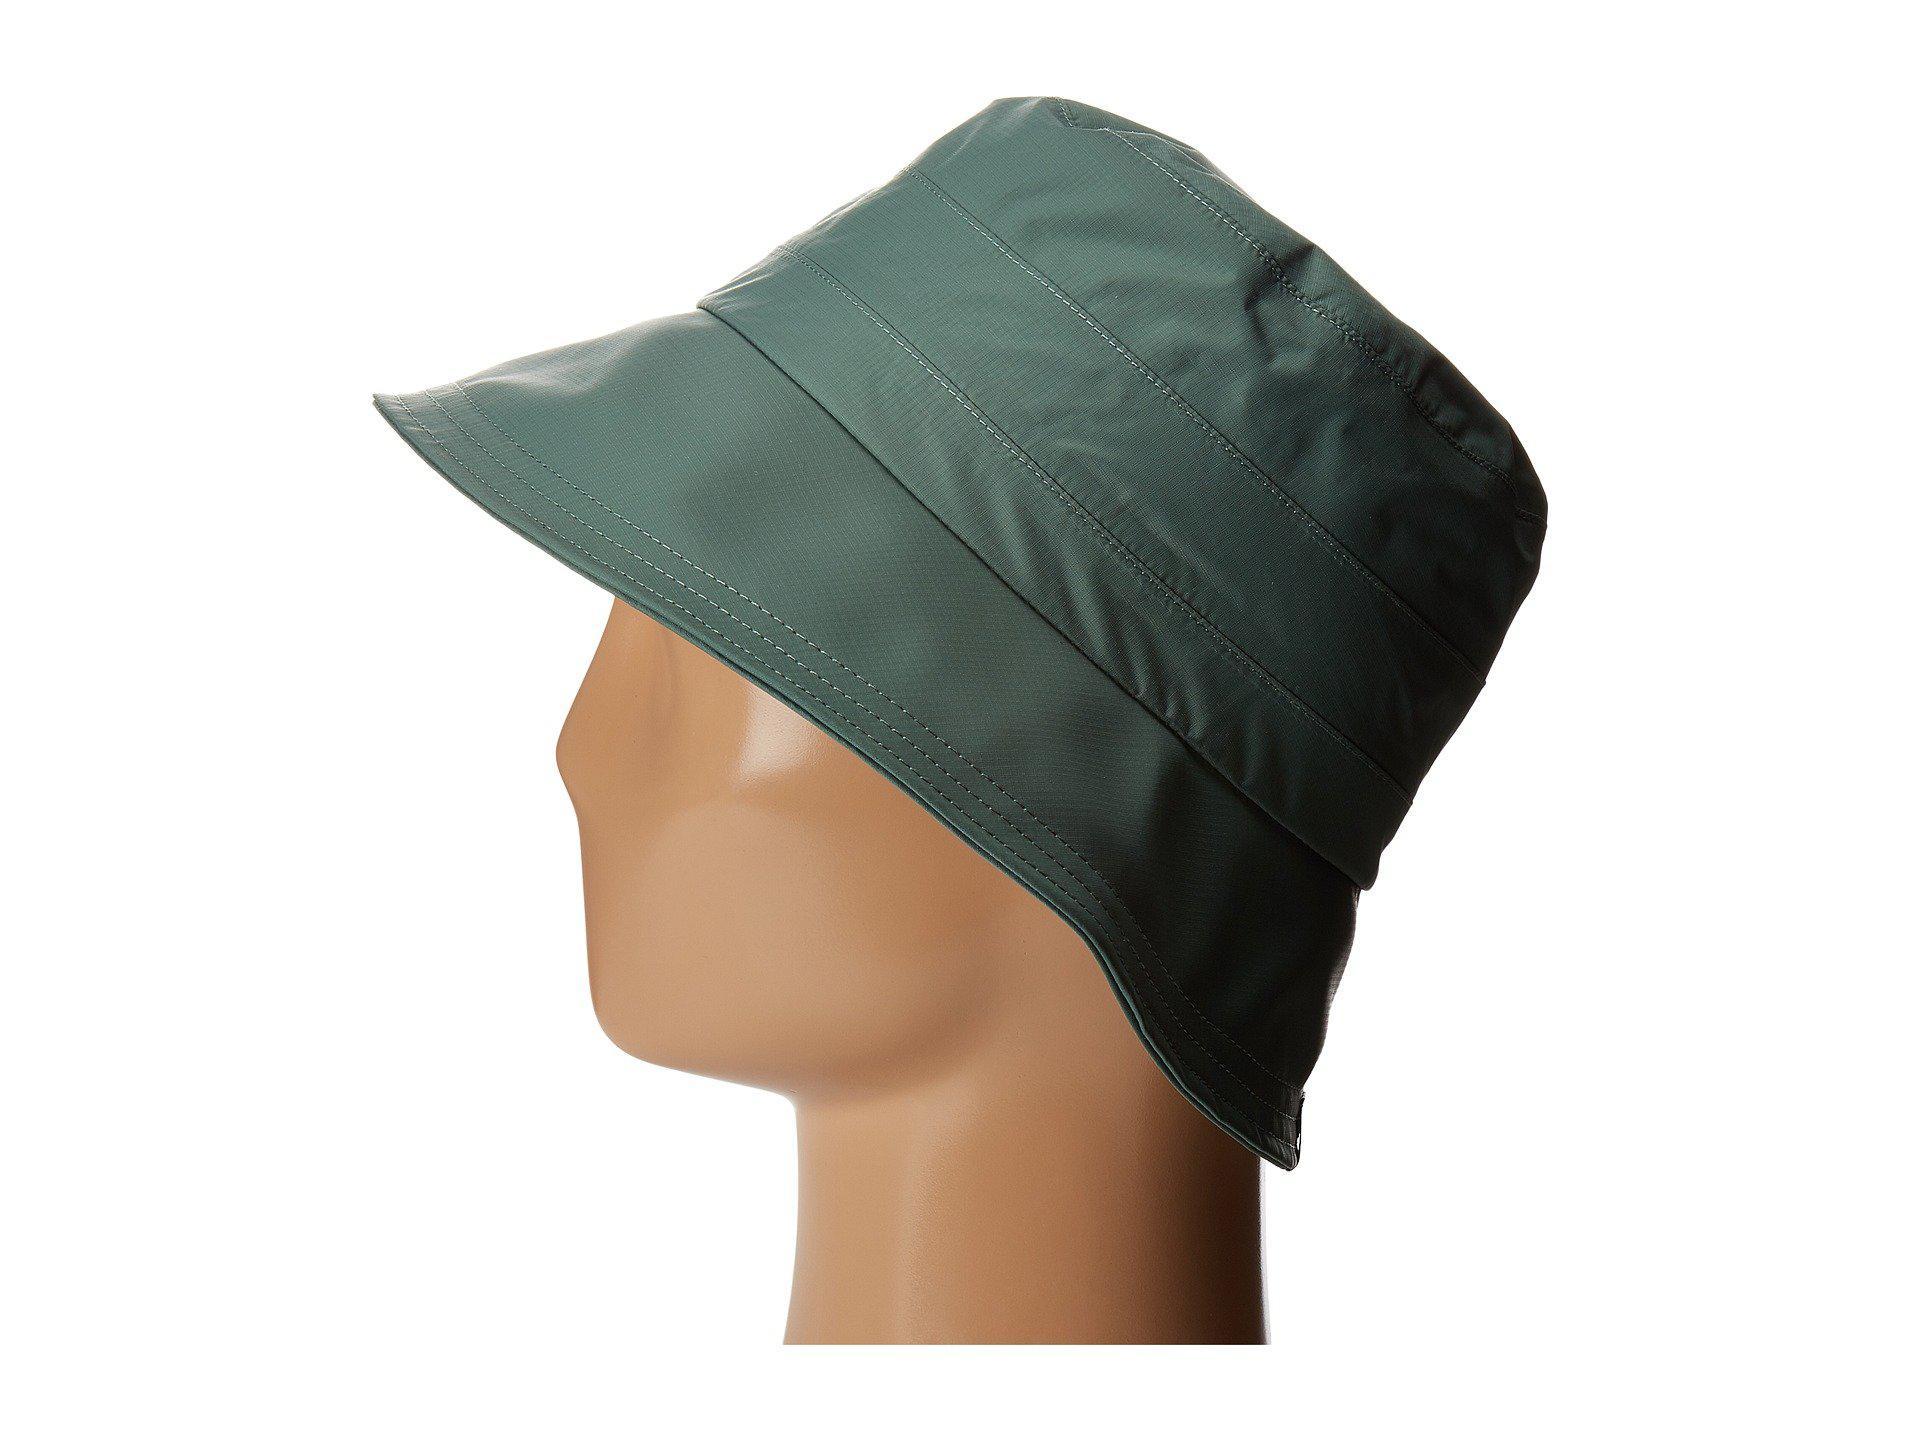 Lyst - Marmot Preclip(r) Petal Hat (dusty Denim) Bucket Caps in Green d4357323cb8